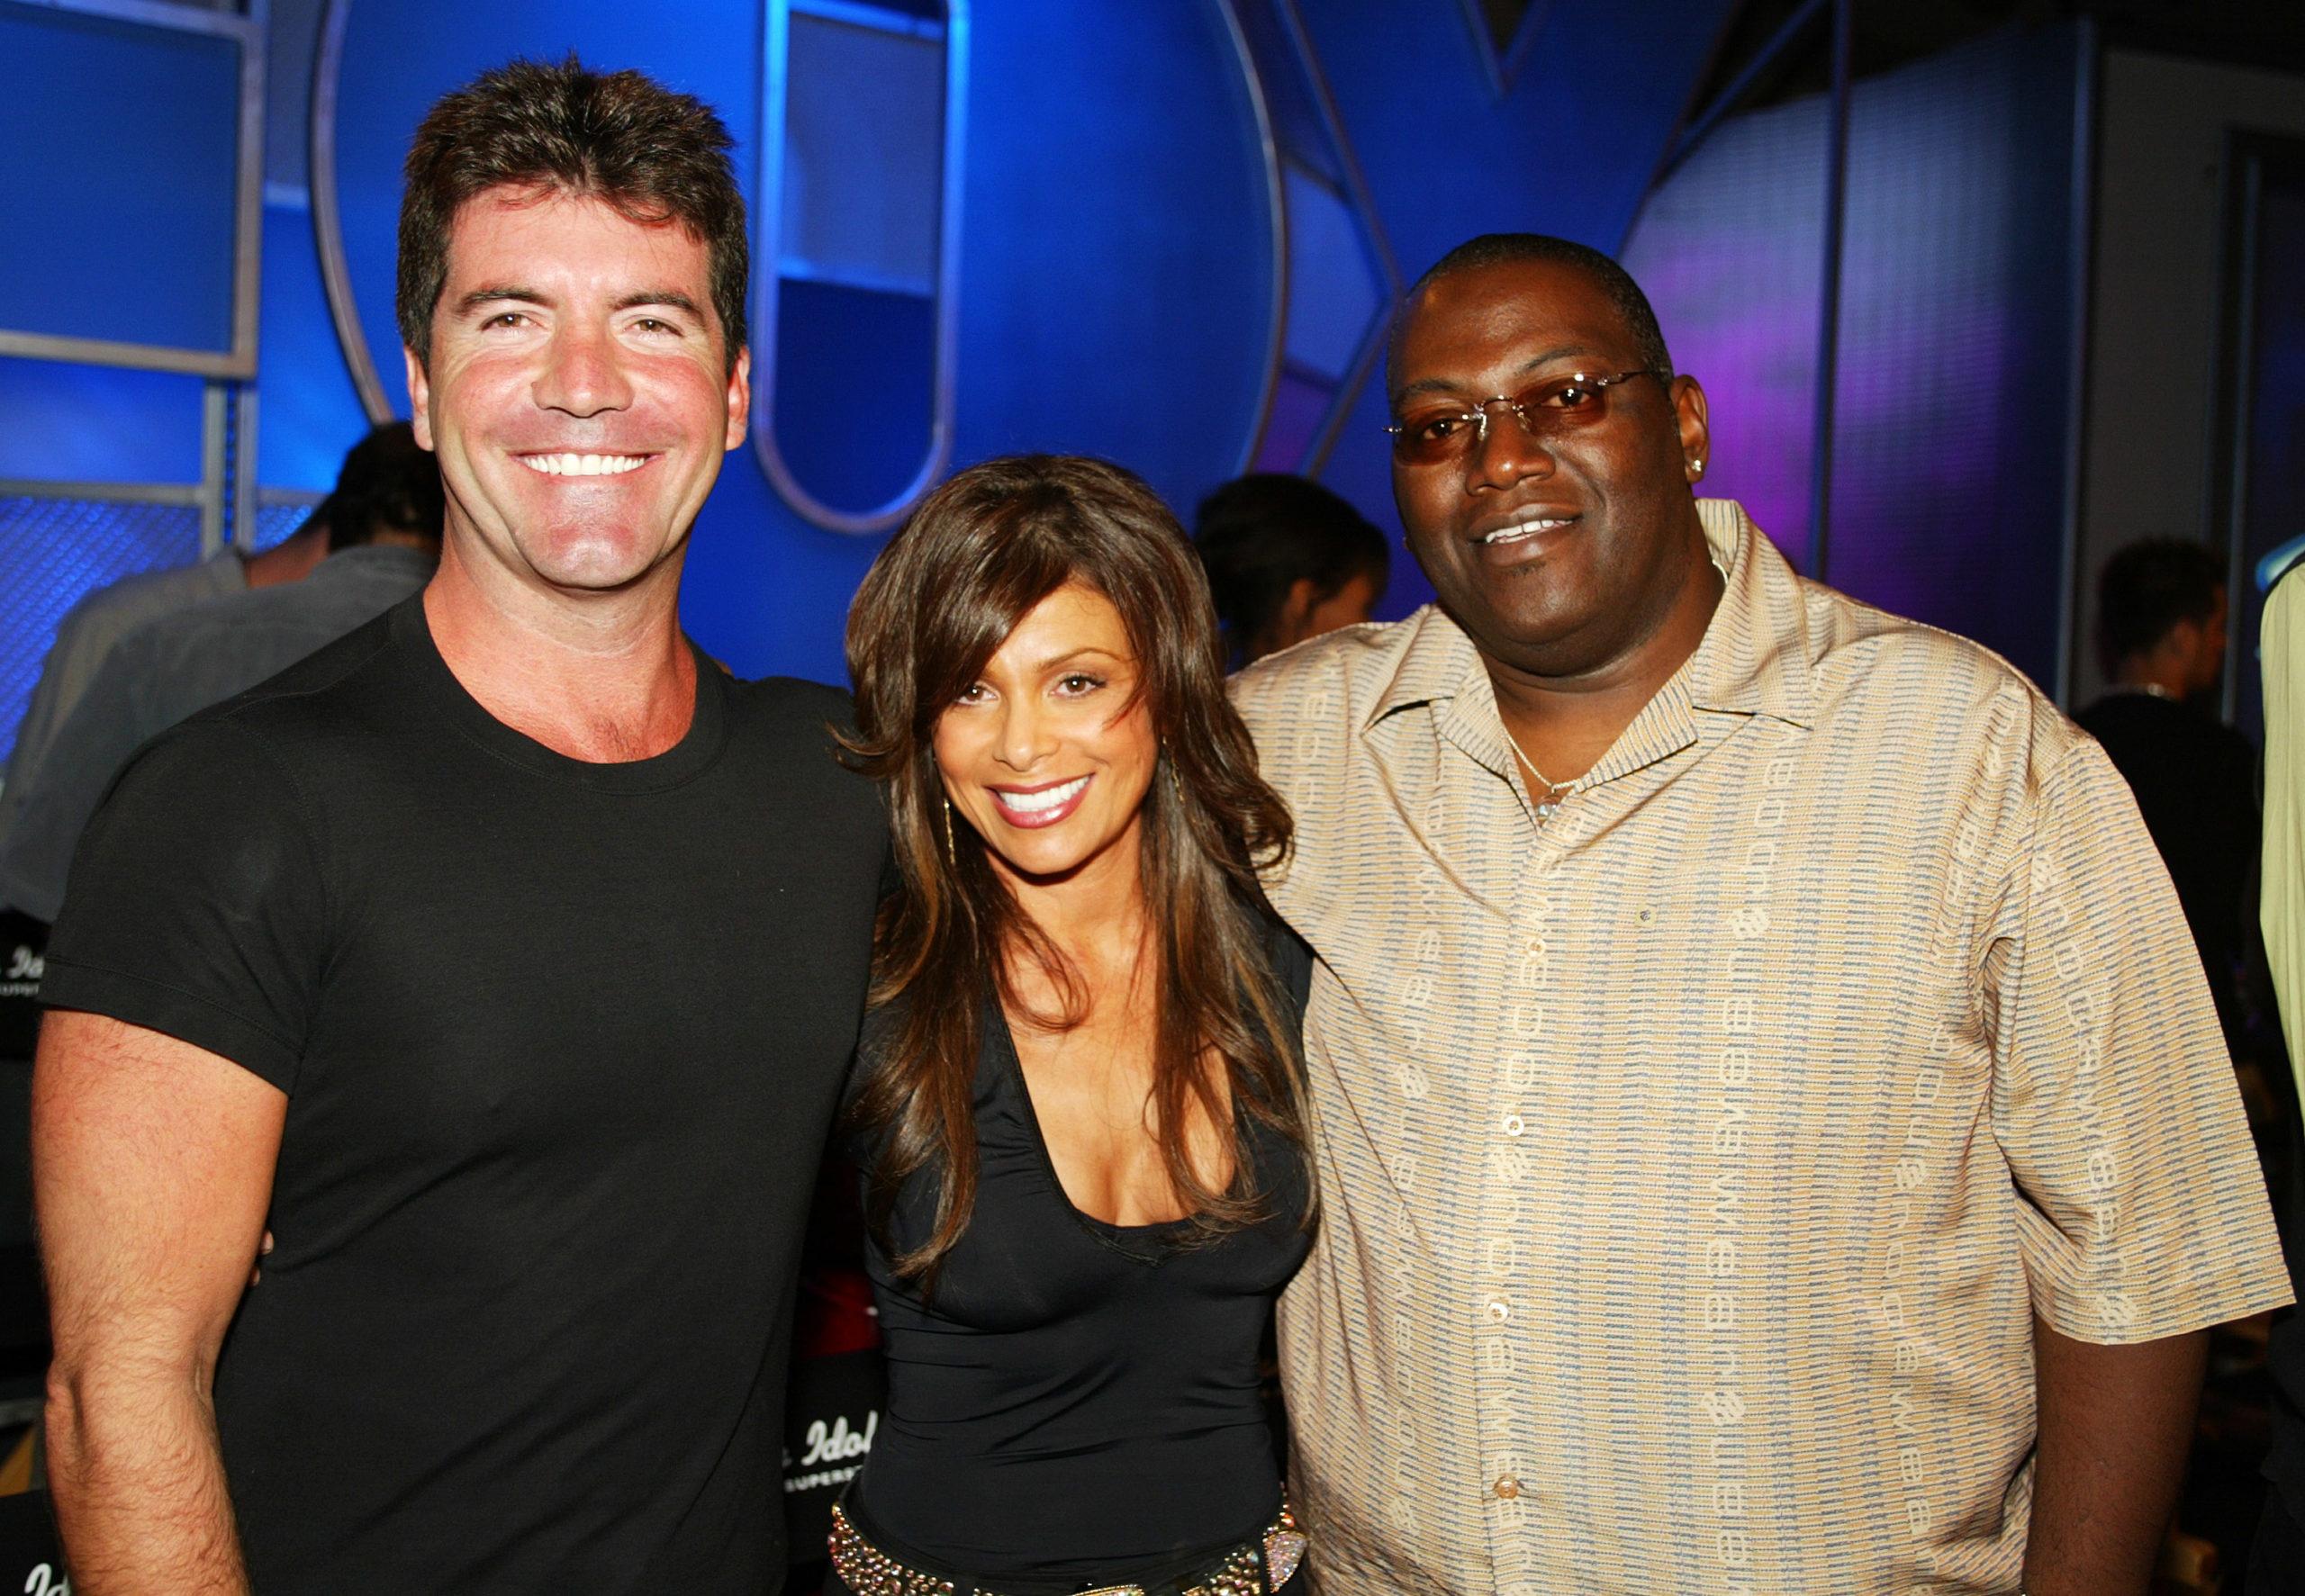 merican Idol judges Simon Cowell, Paula Abdul, Randy Jackson